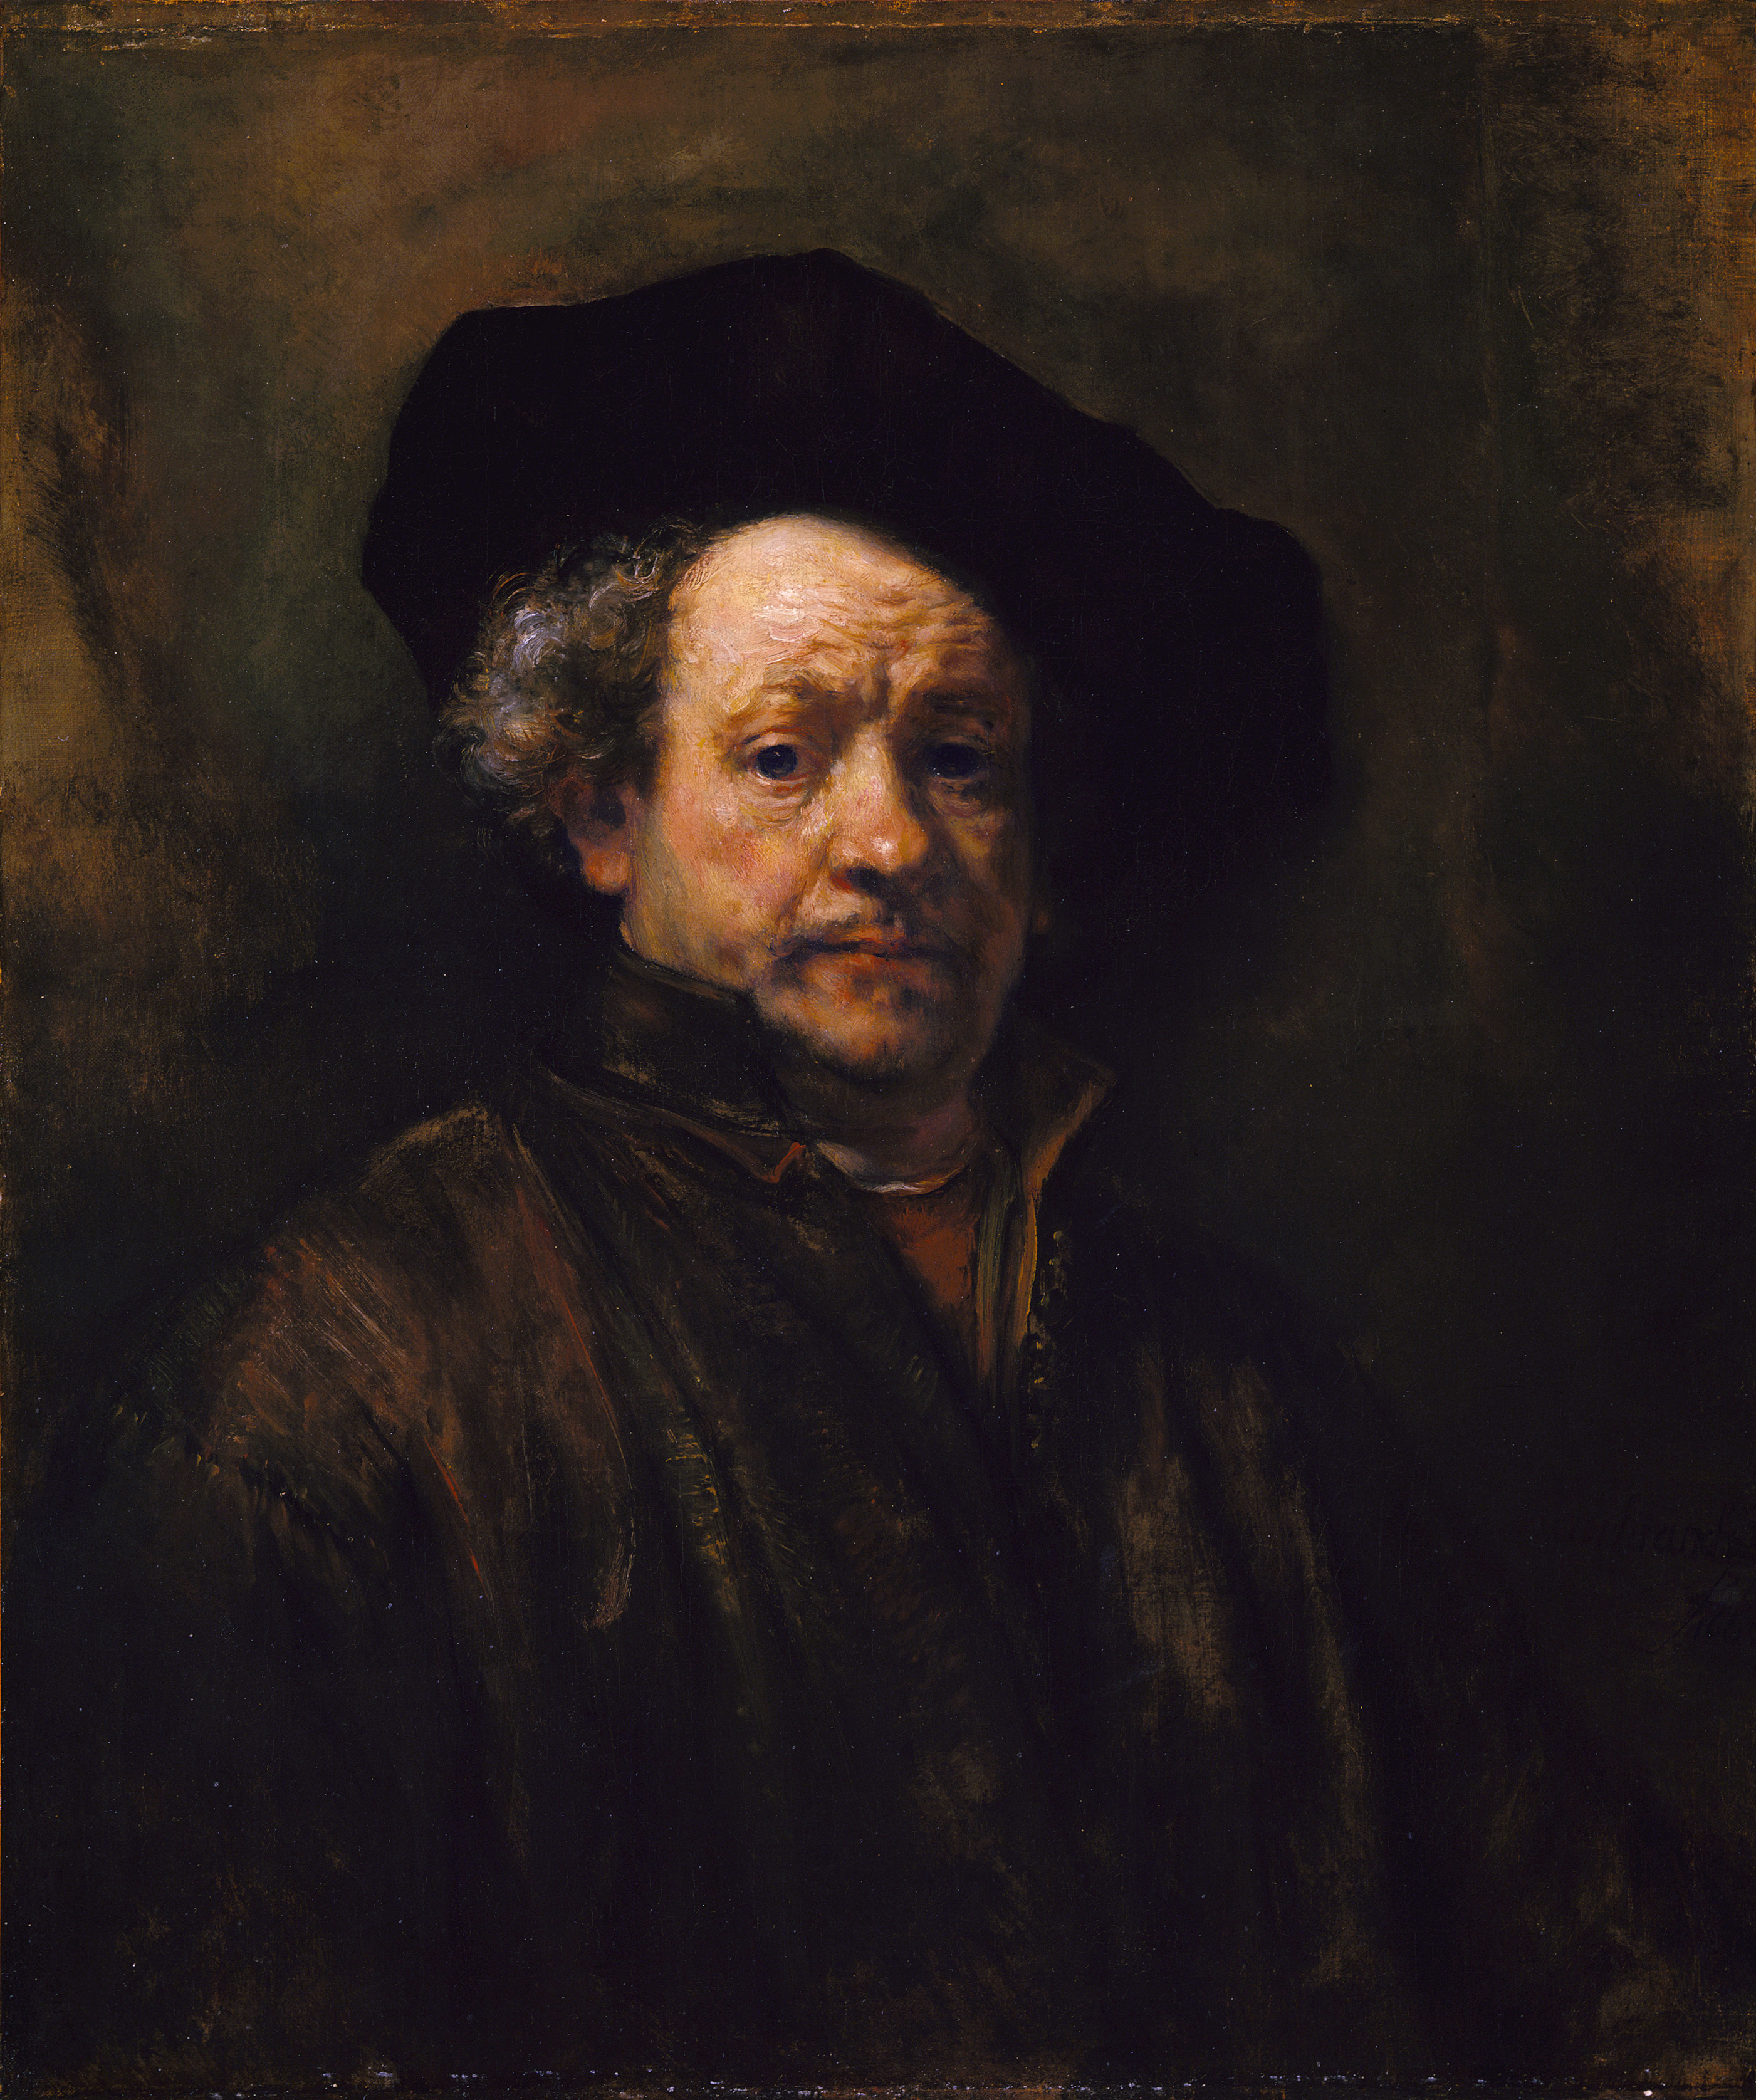 Rembrandt: Self Portrait (Altman)